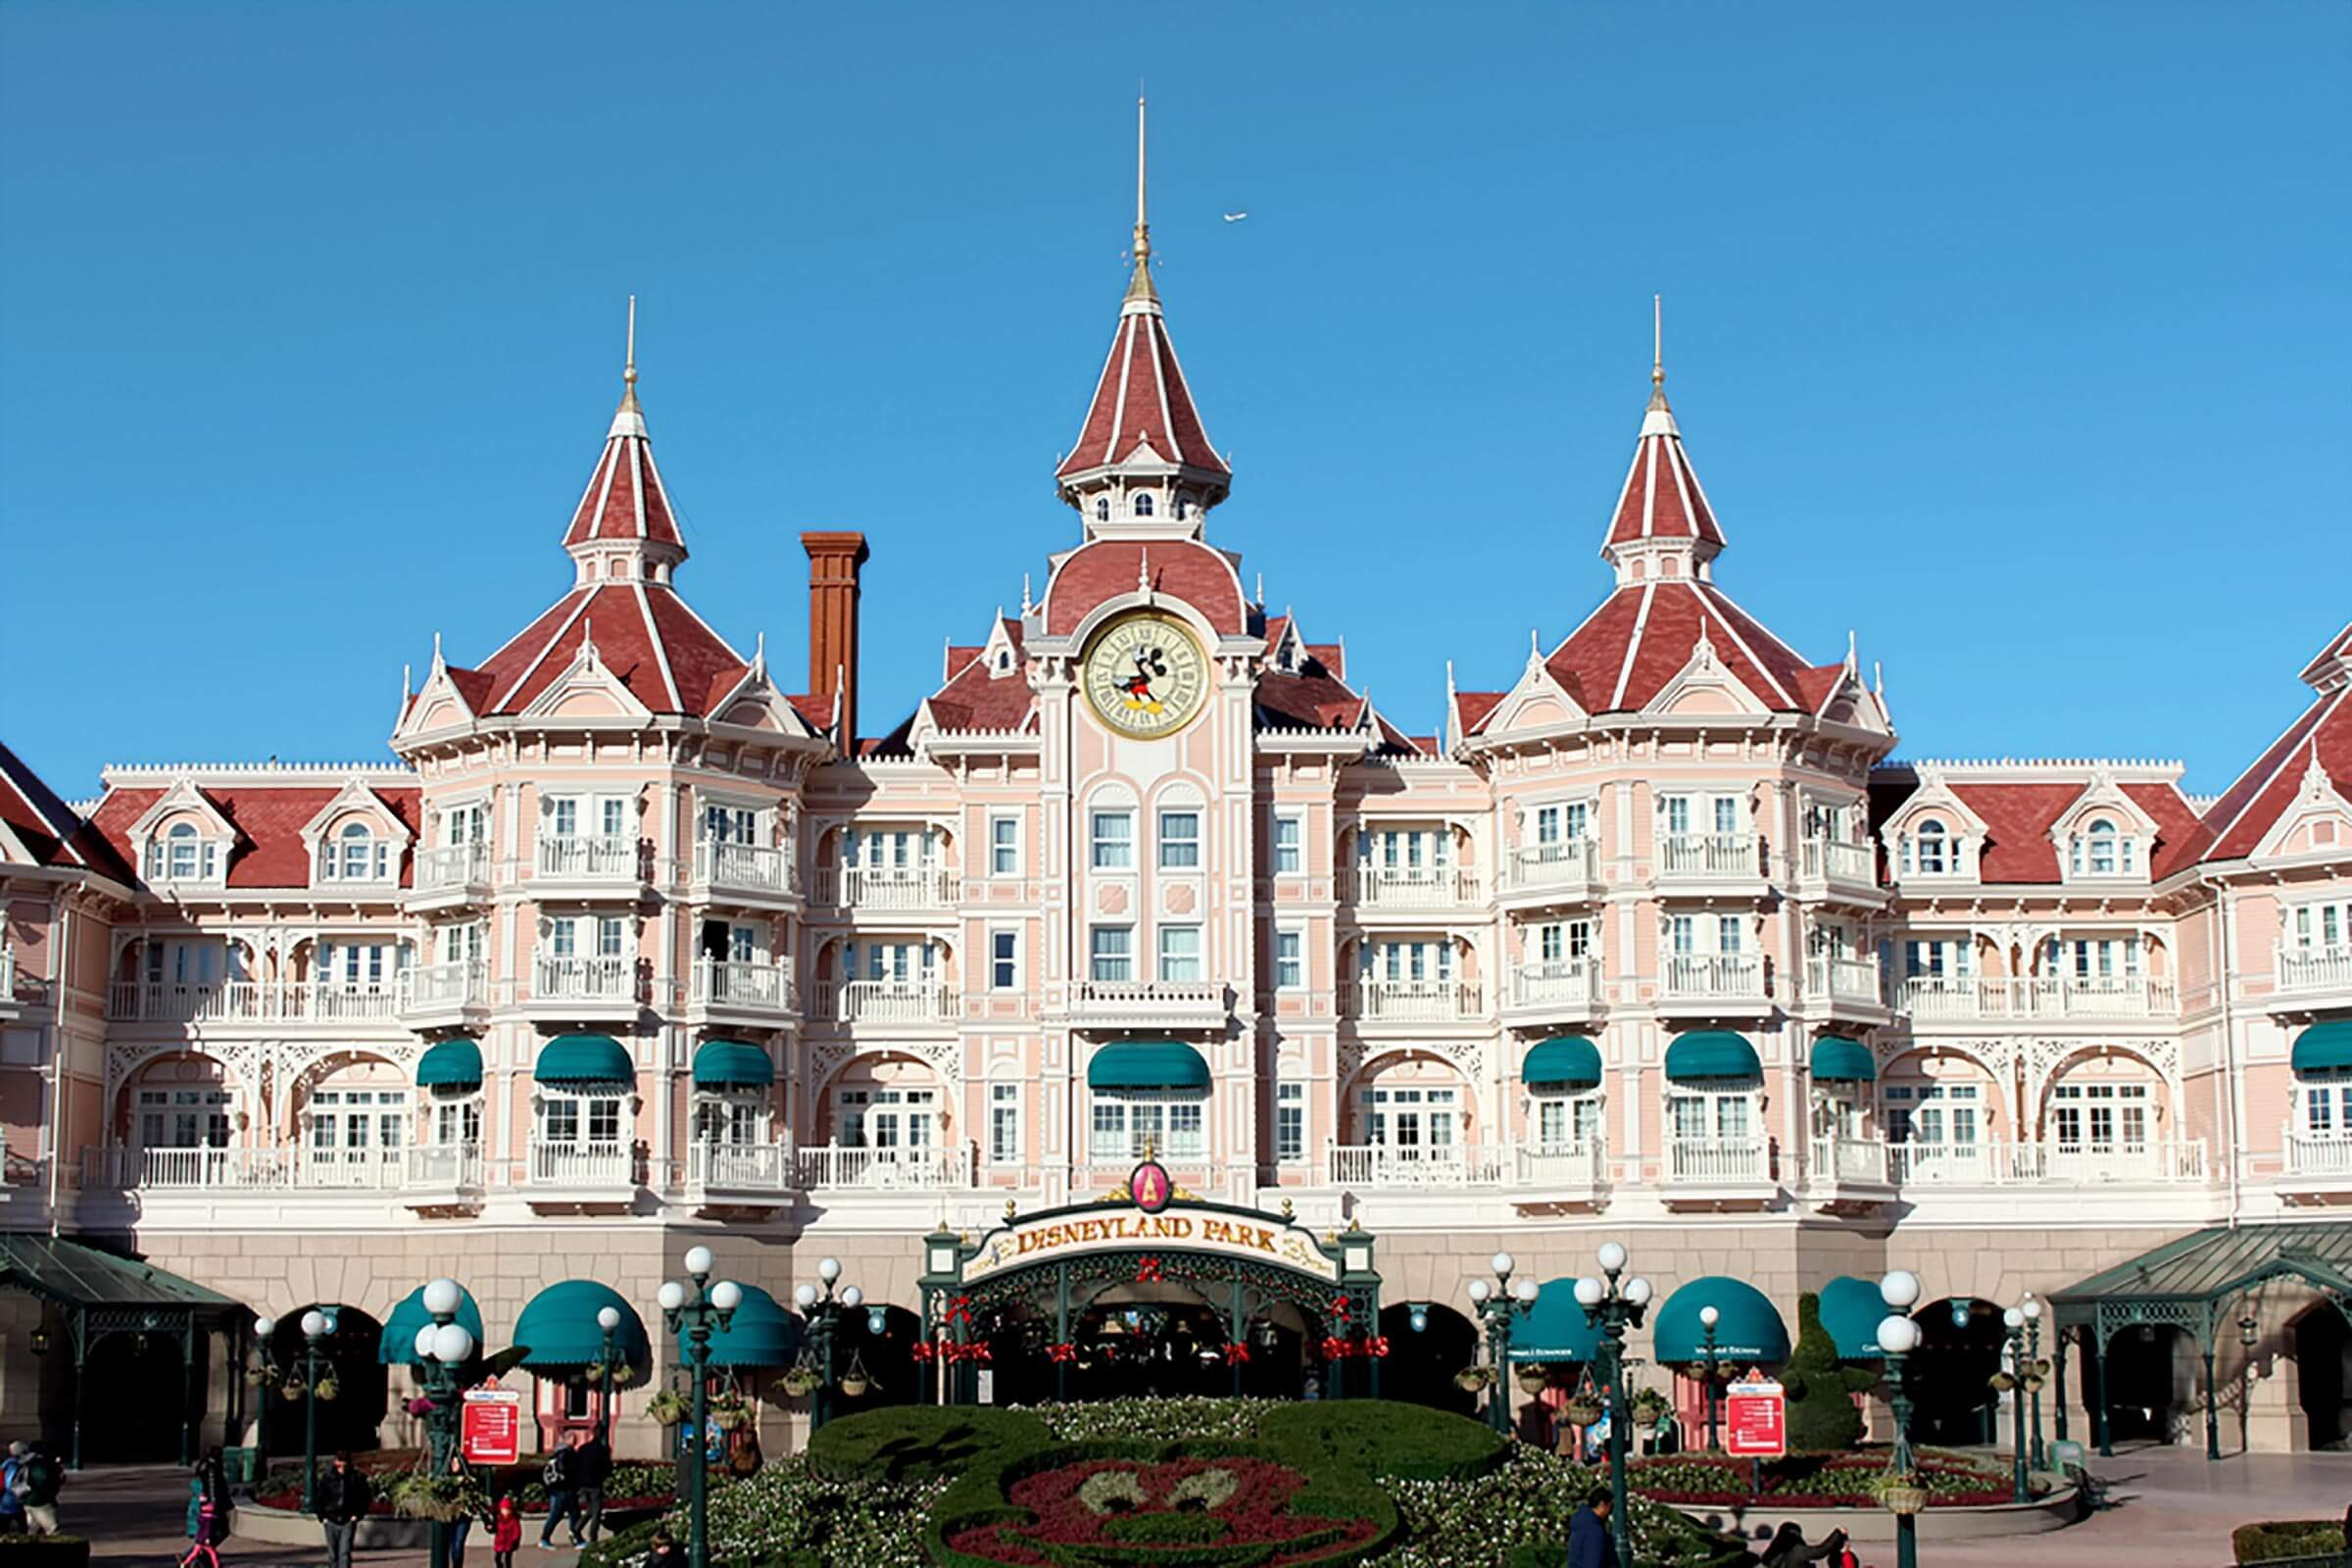 DISNEYLAND, PARIS - NOVEMBER 22, 2015: Disneyland Park in Paris, France. Disney is the first entertainment group in the world in 2012.